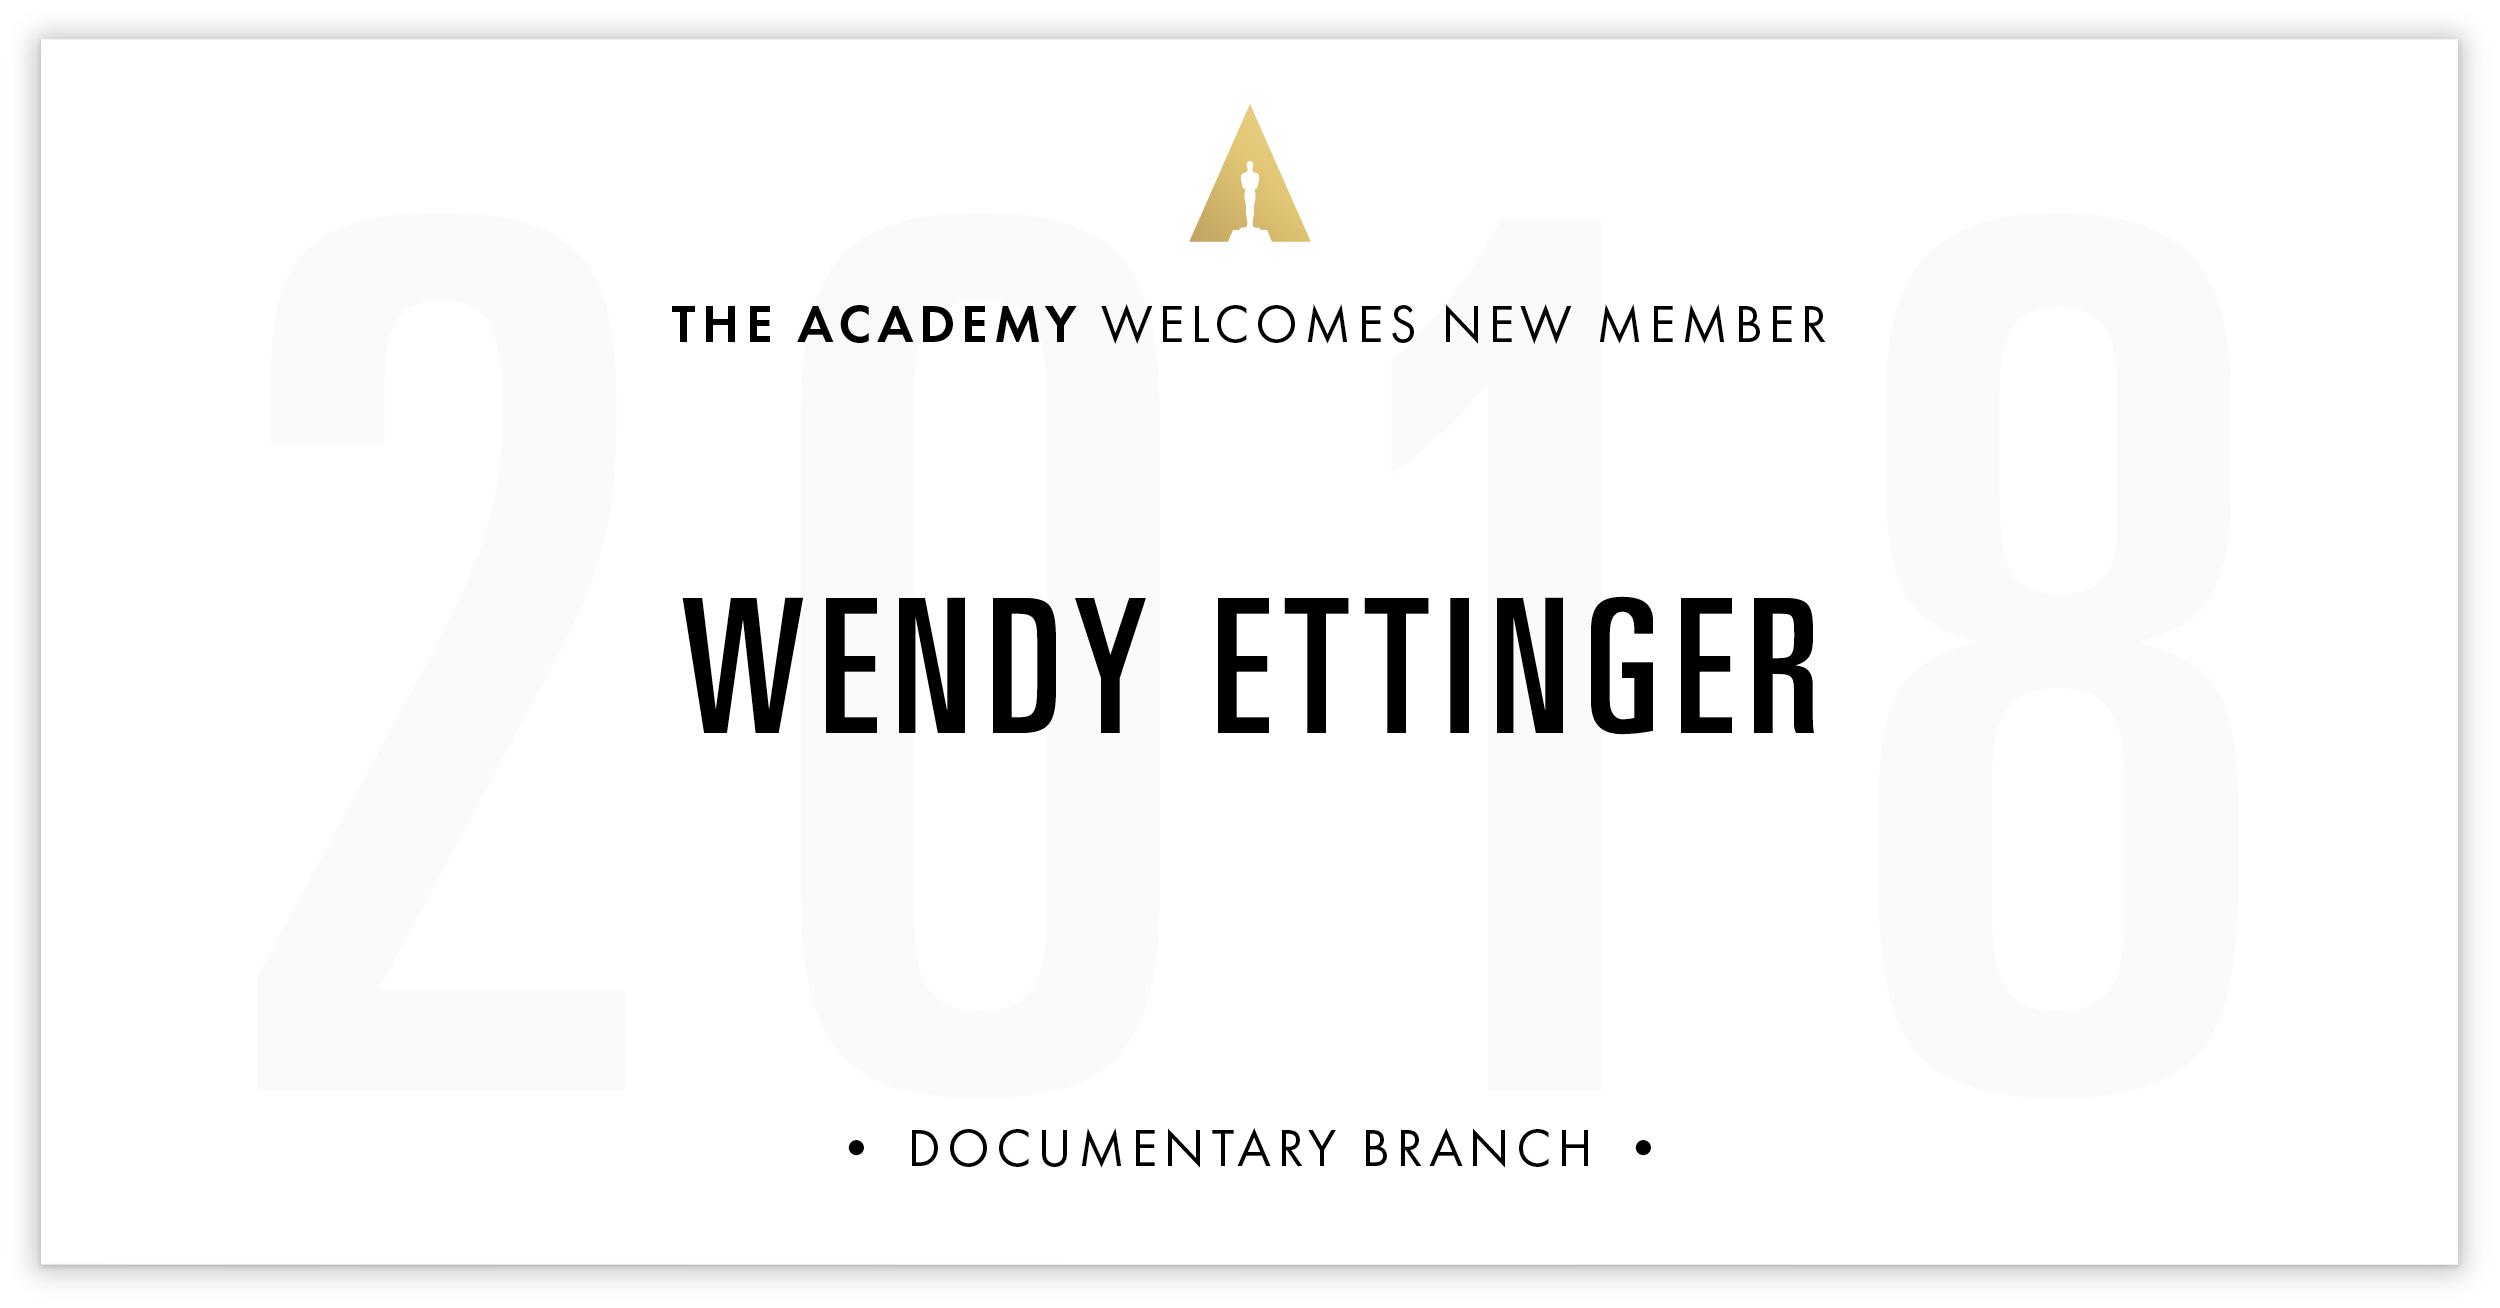 Wendy Ettinger is invited!